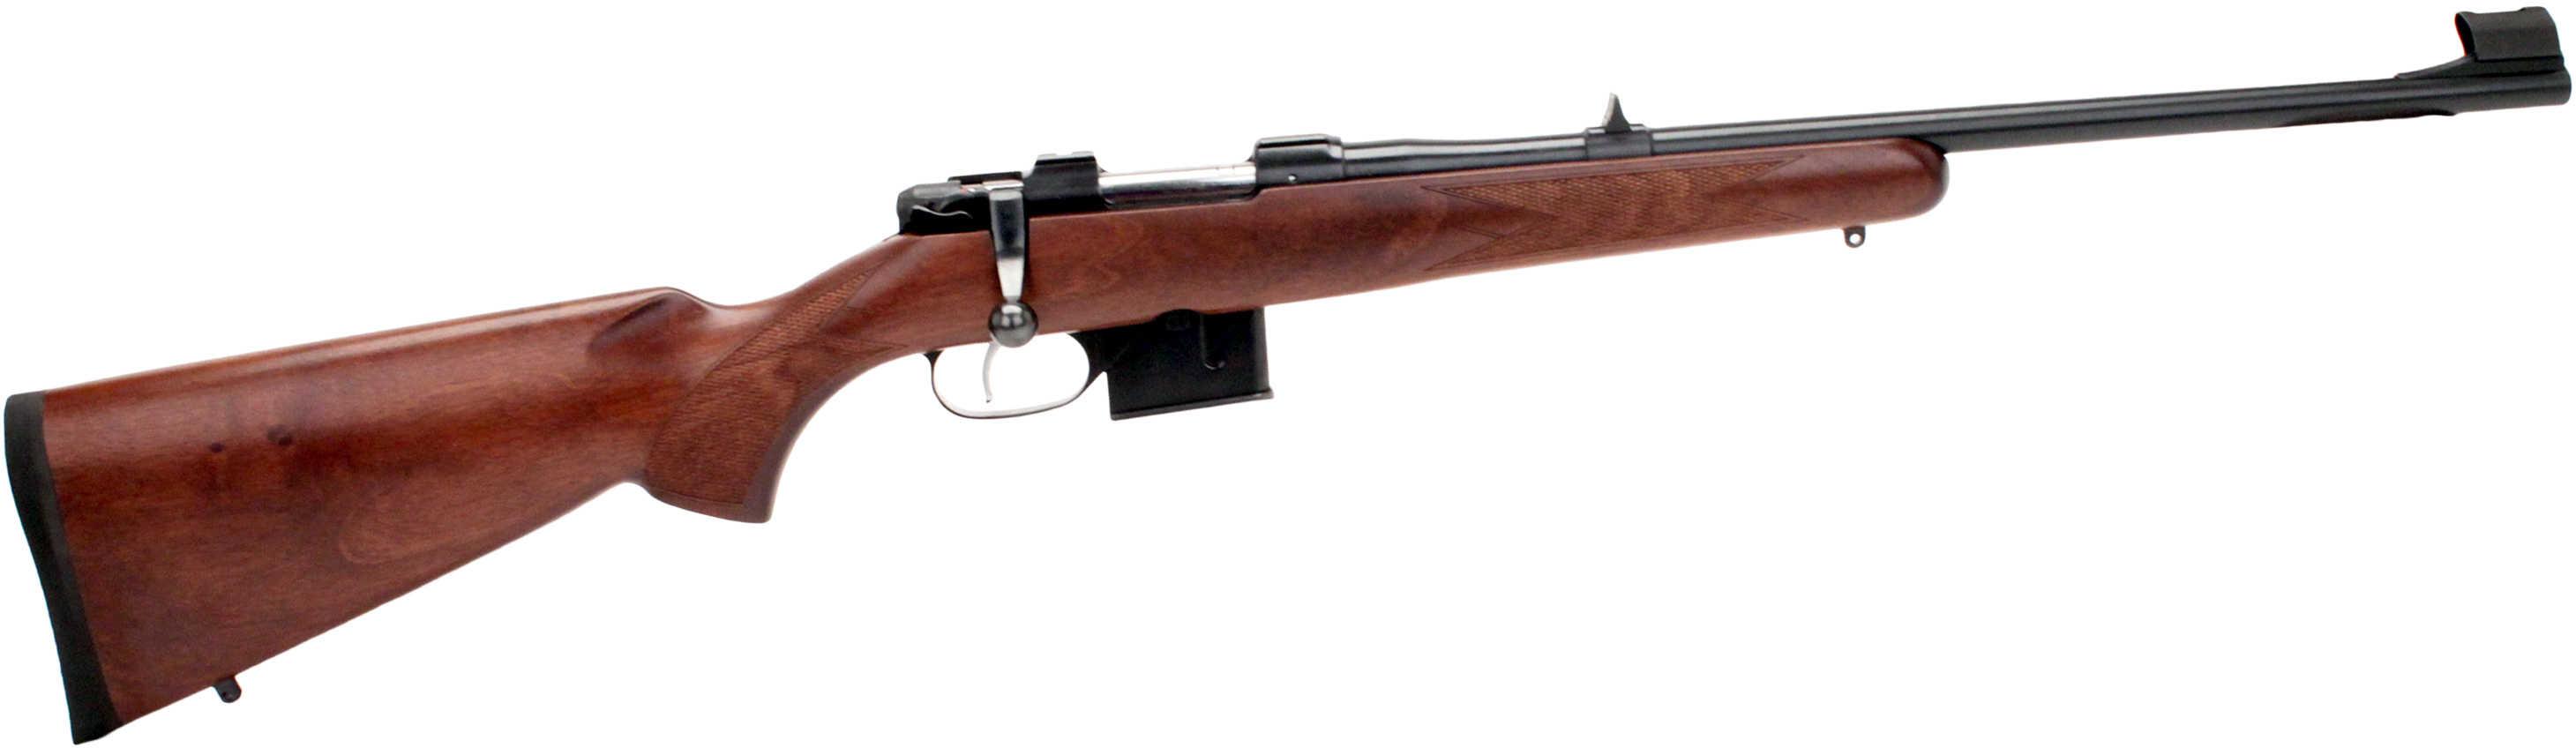 CZ 527 7.62X39mm Carbine Bolt Action Rifle Single Set Trigger Blued Barrel Walnut Wood Stock Micro Length Action 03050